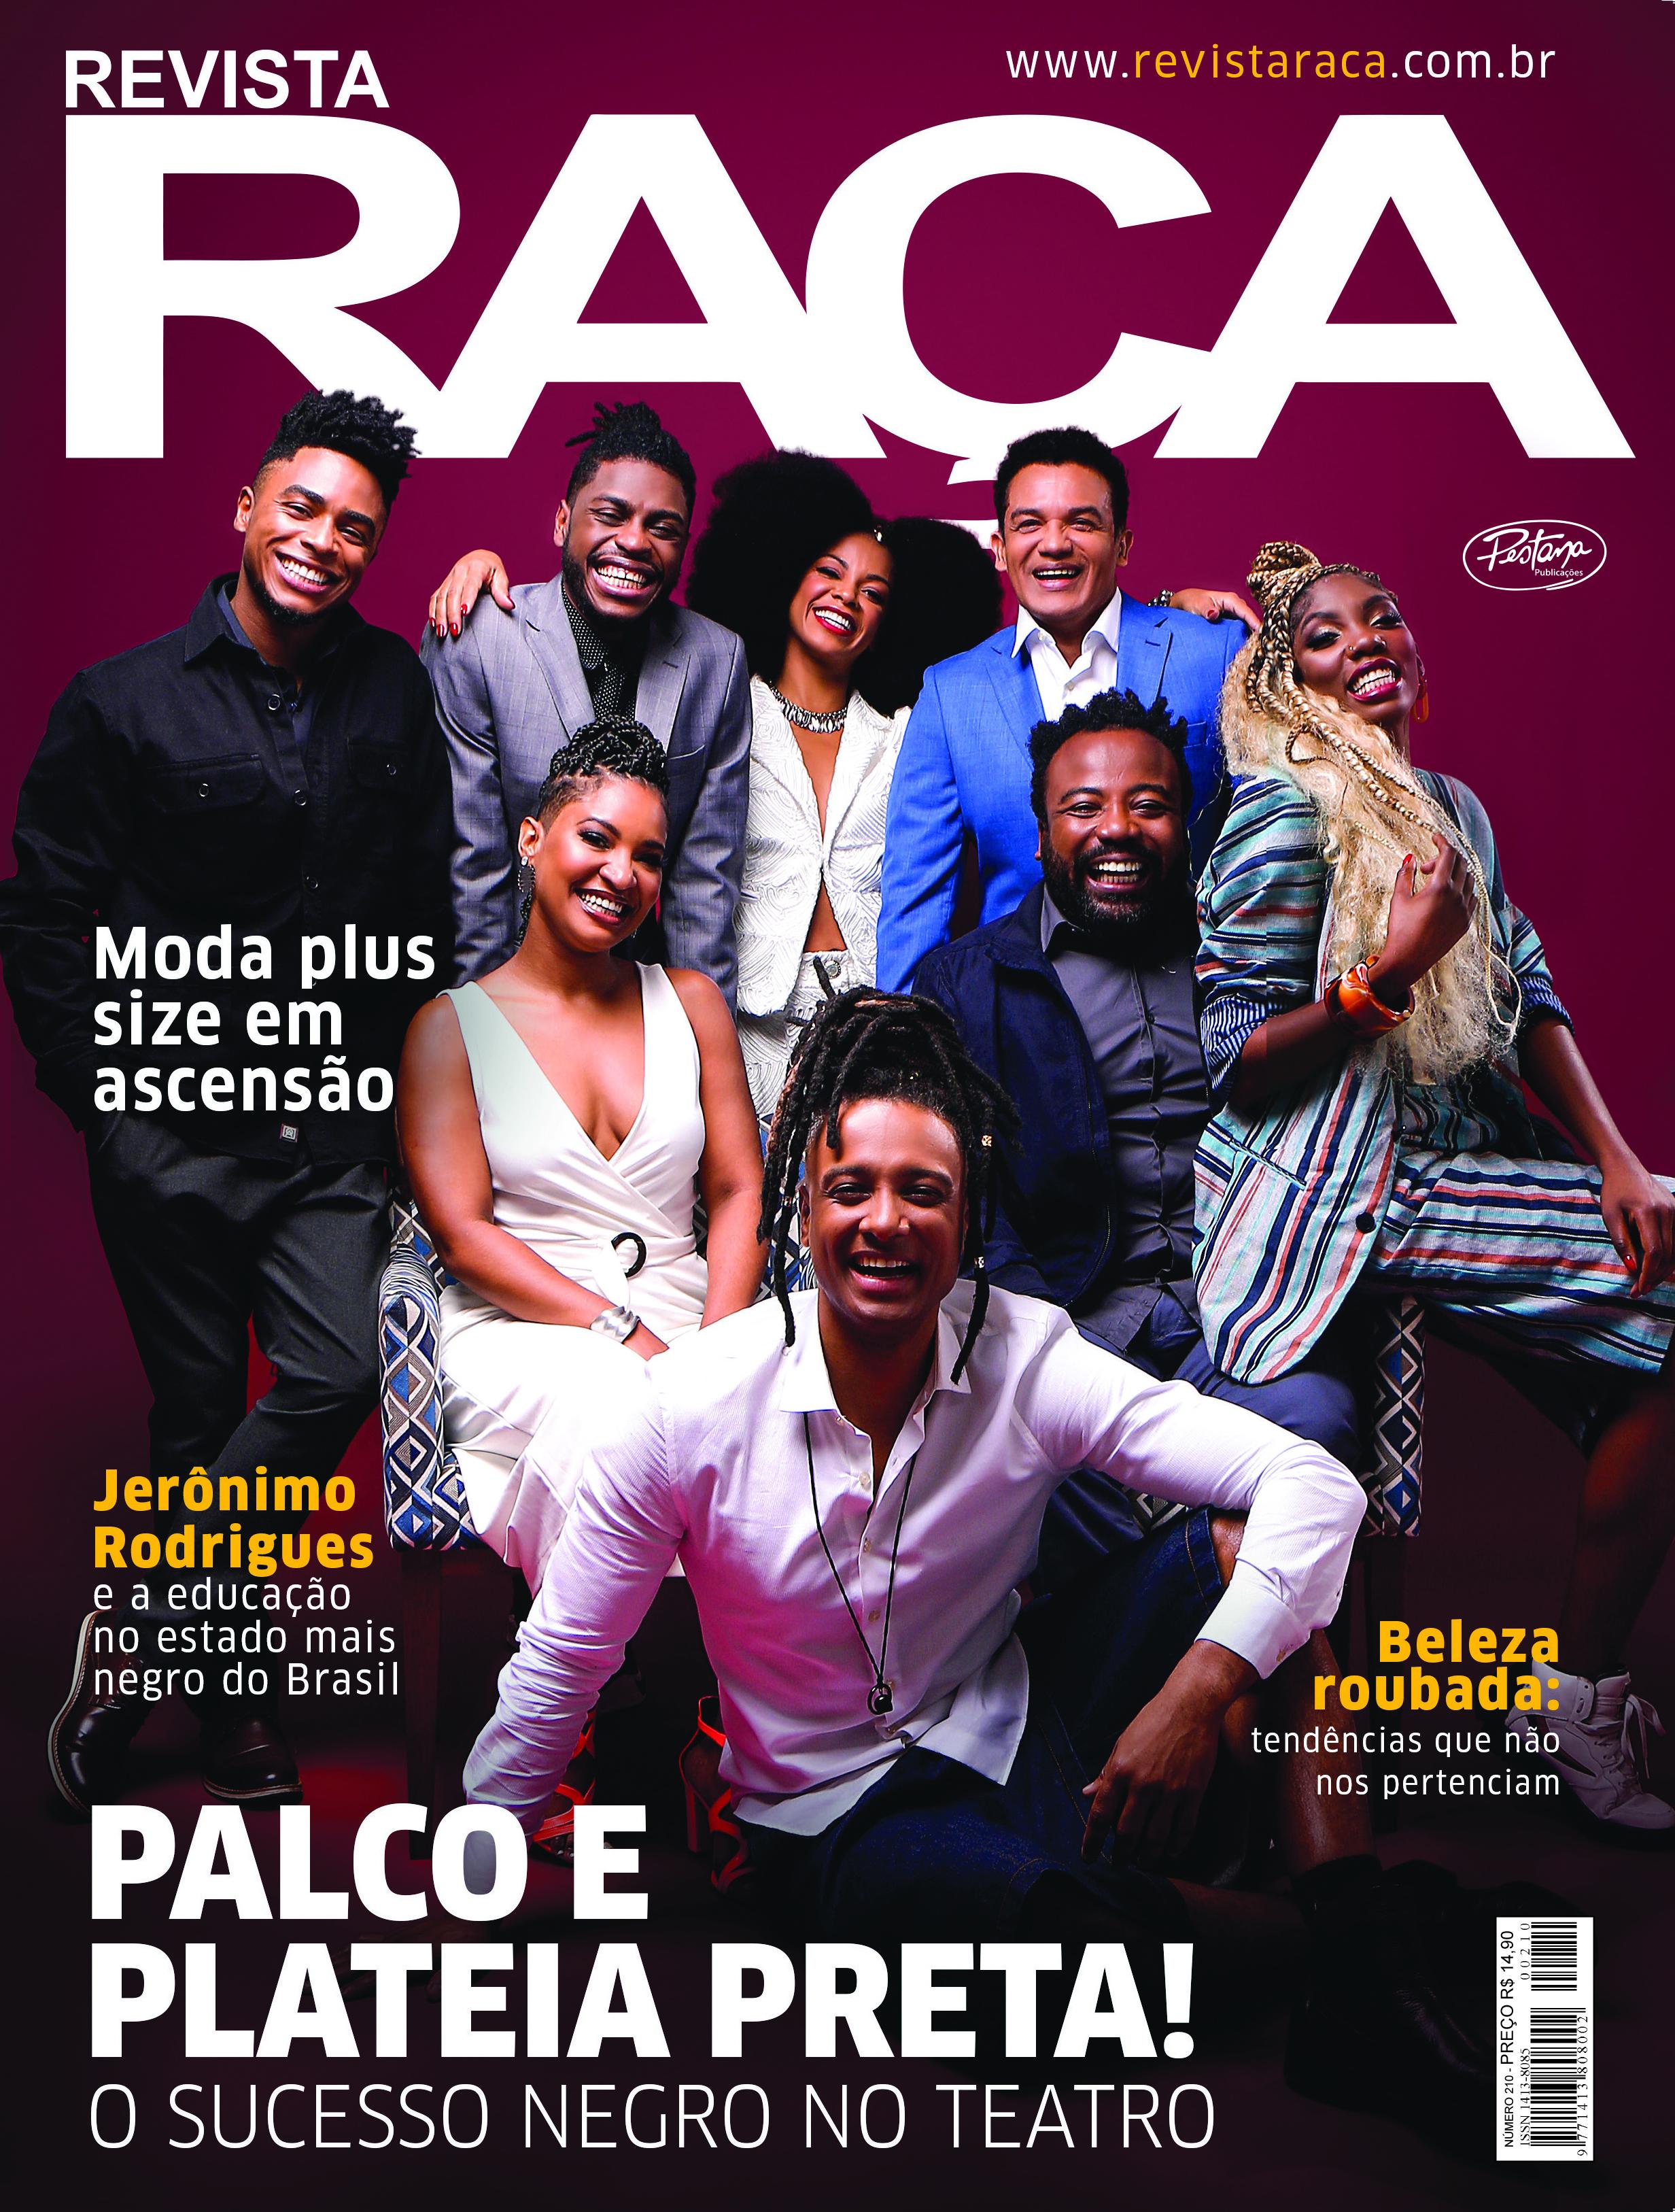 https://revistaraca.com.br/wp-content/uploads/2020/03/capa210.jpg